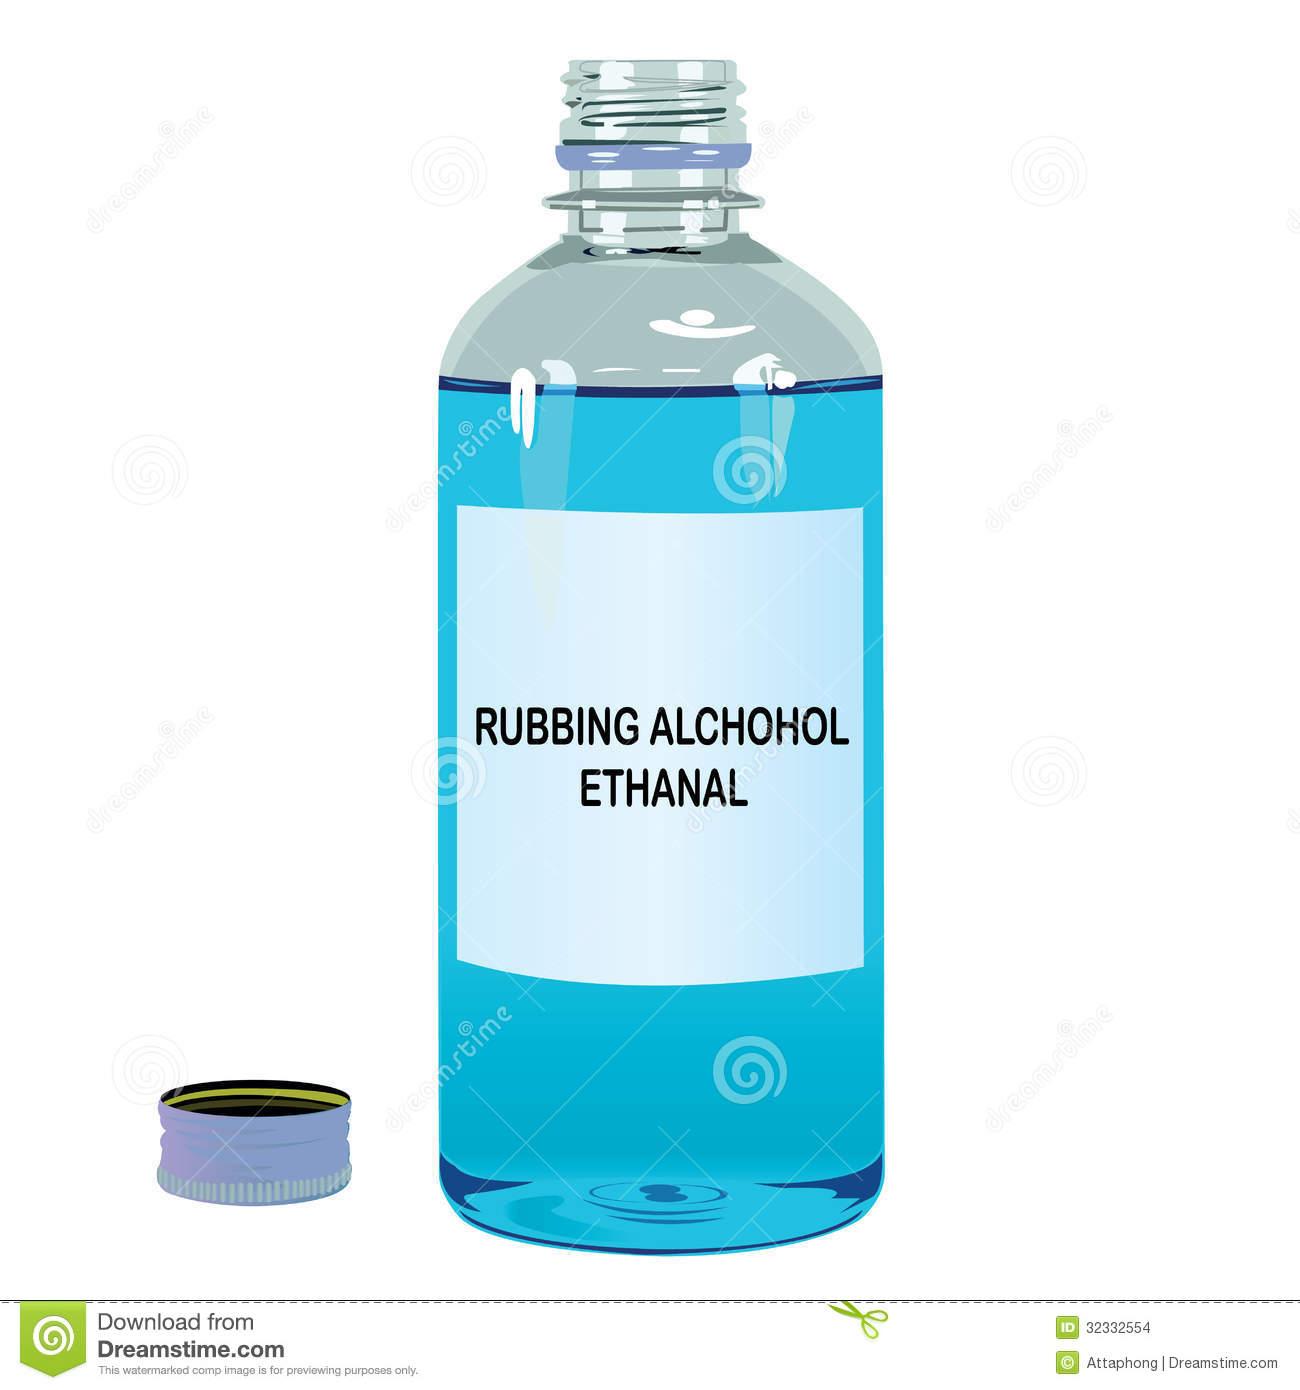 Rubbing . Alcohol clipart medical